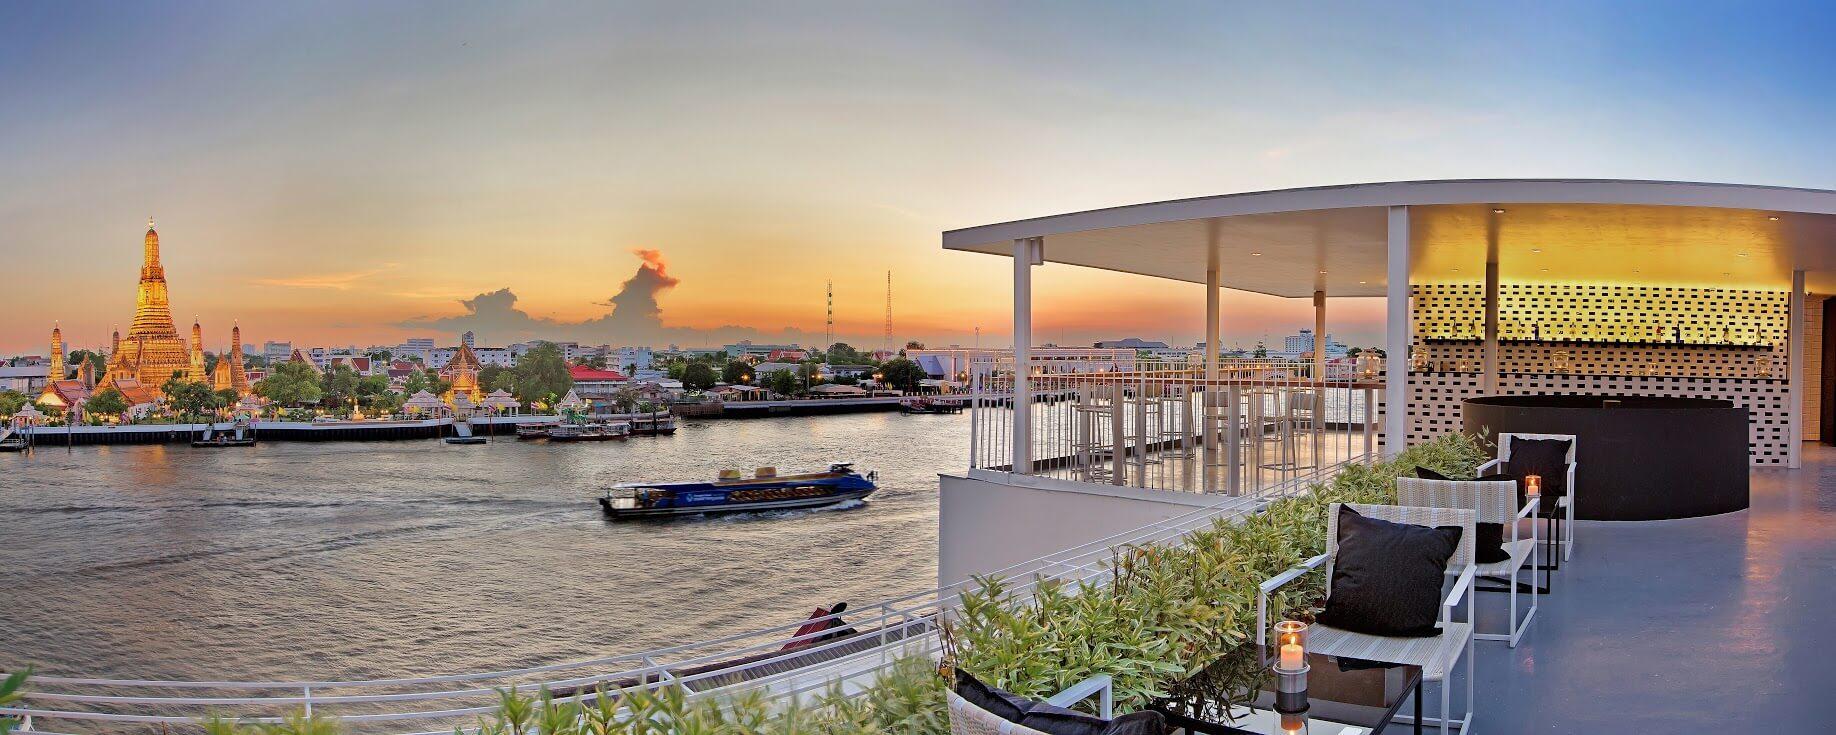 Sala-Rattanakosin-Hotel-Bangkok